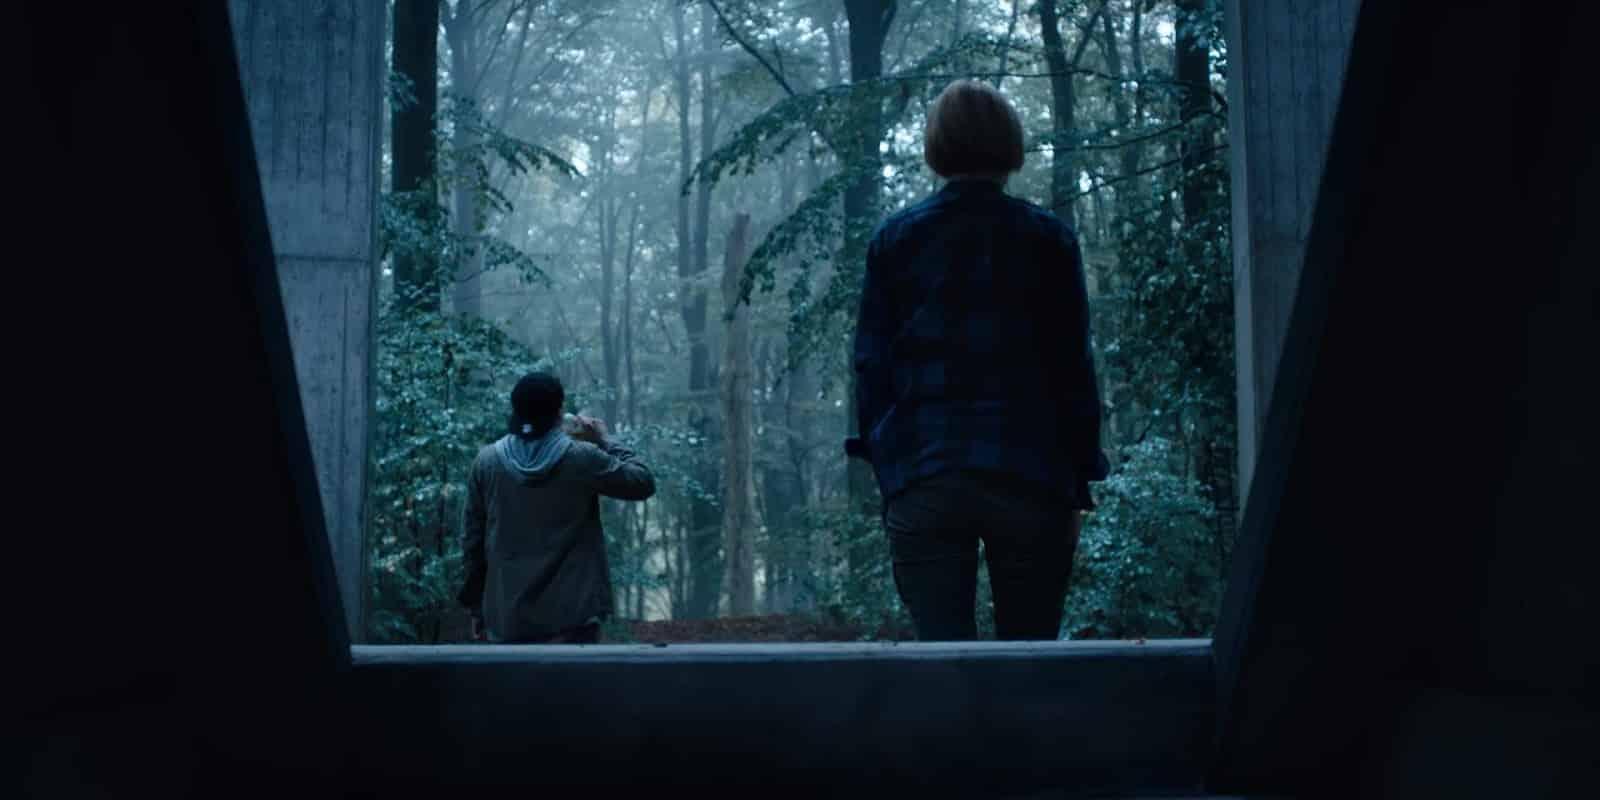 The Rain (1ª Temporada) – O Ultimato